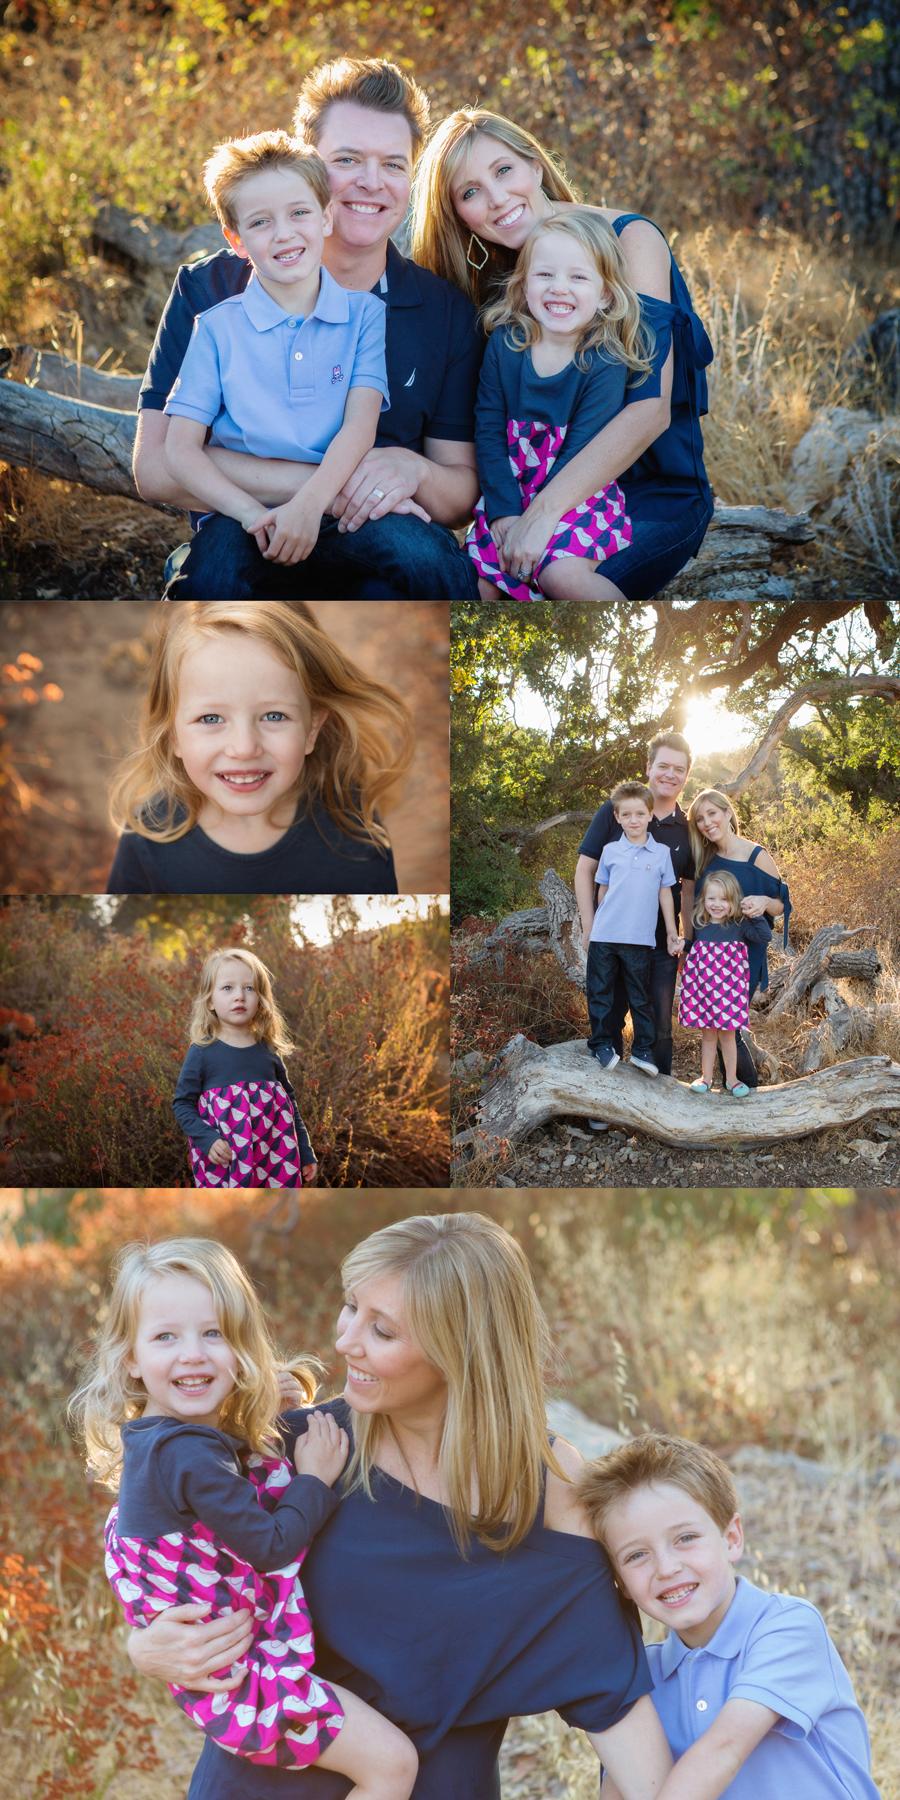 Family Photographer in Ventura County, California